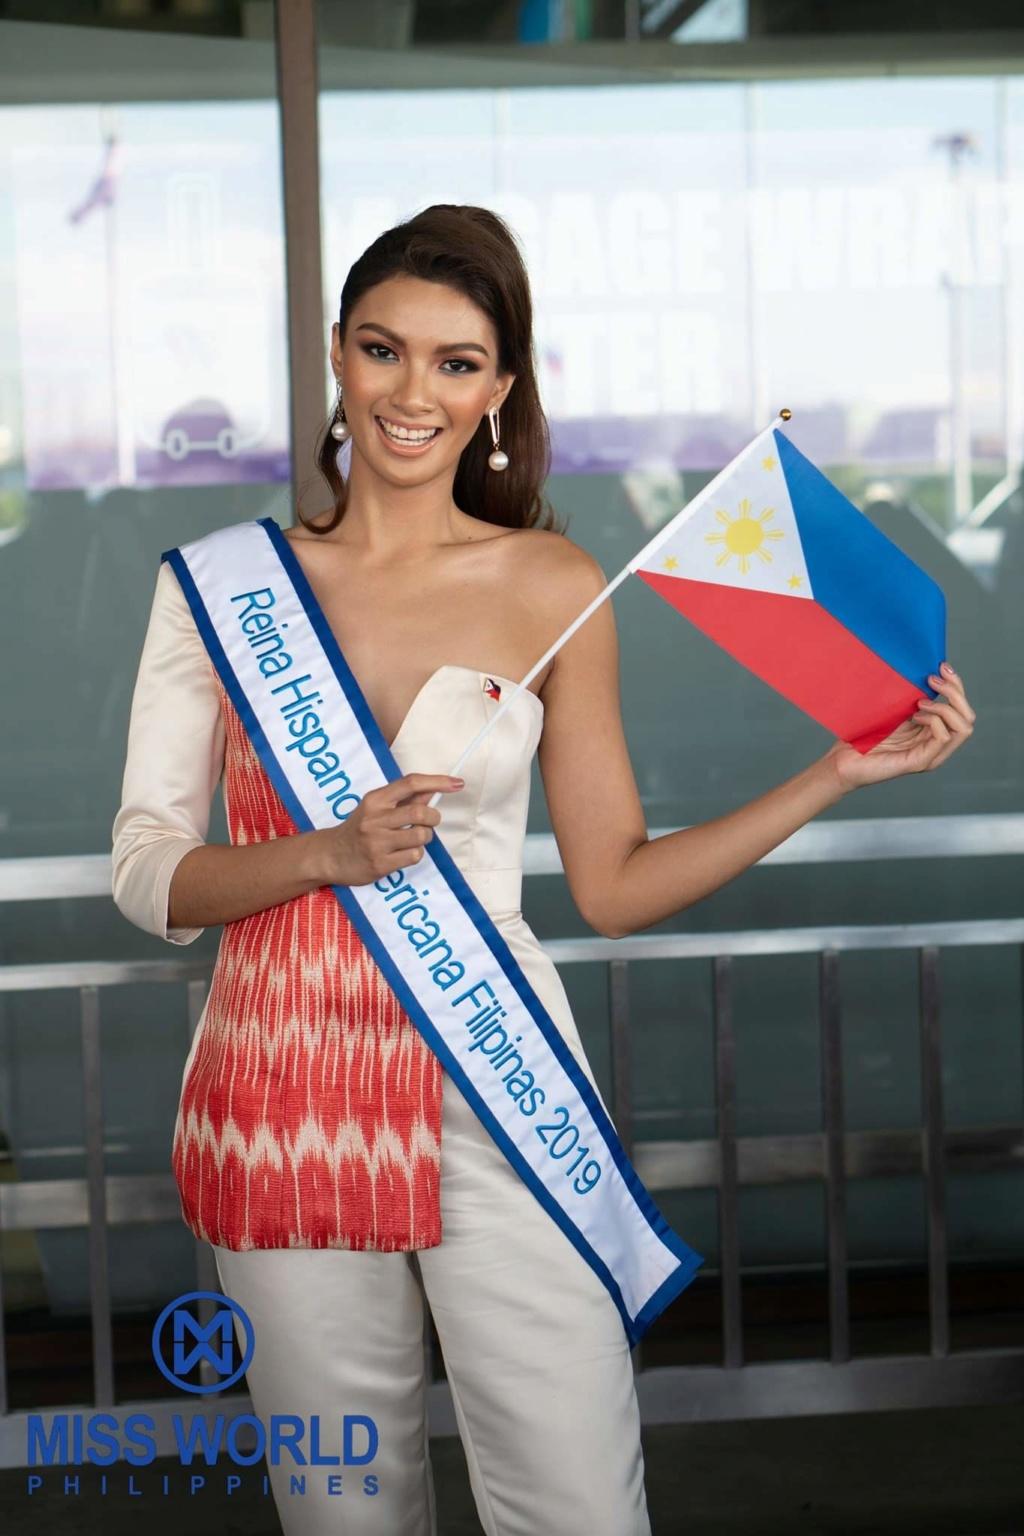 Reina Hispanoamericana Filipinas 2019: Katrina Llegado Fb_11797